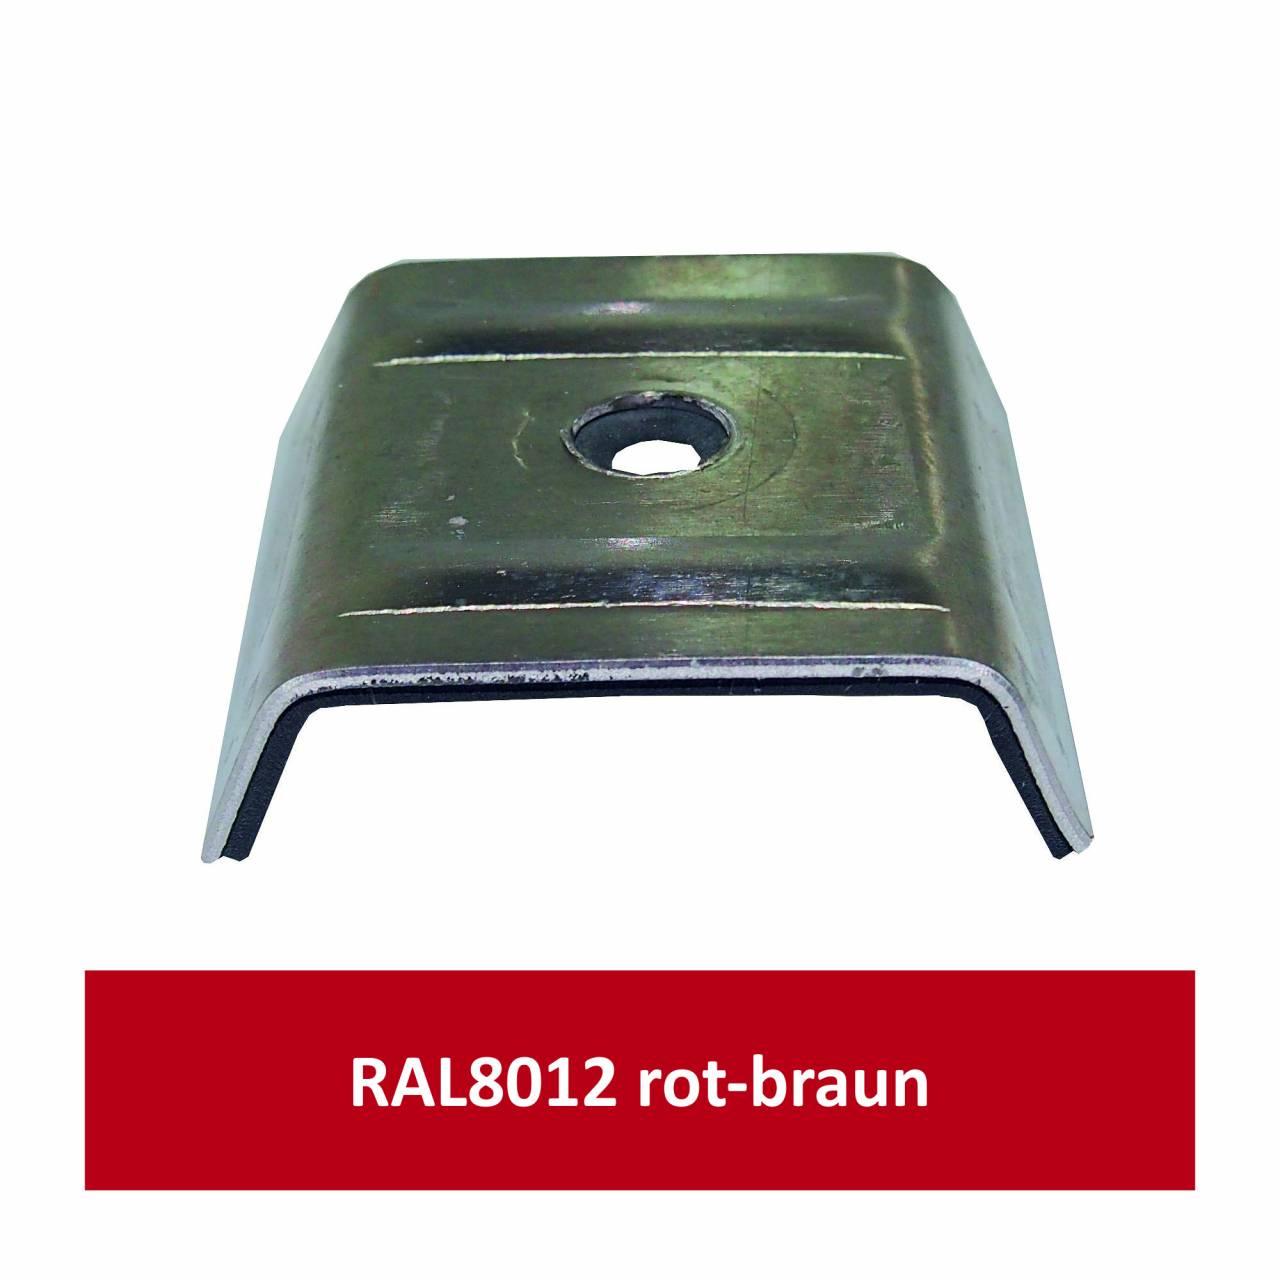 Kalotten für Kingspan, Alu RAL8012 rotbraun/ Pck a 100 Stück